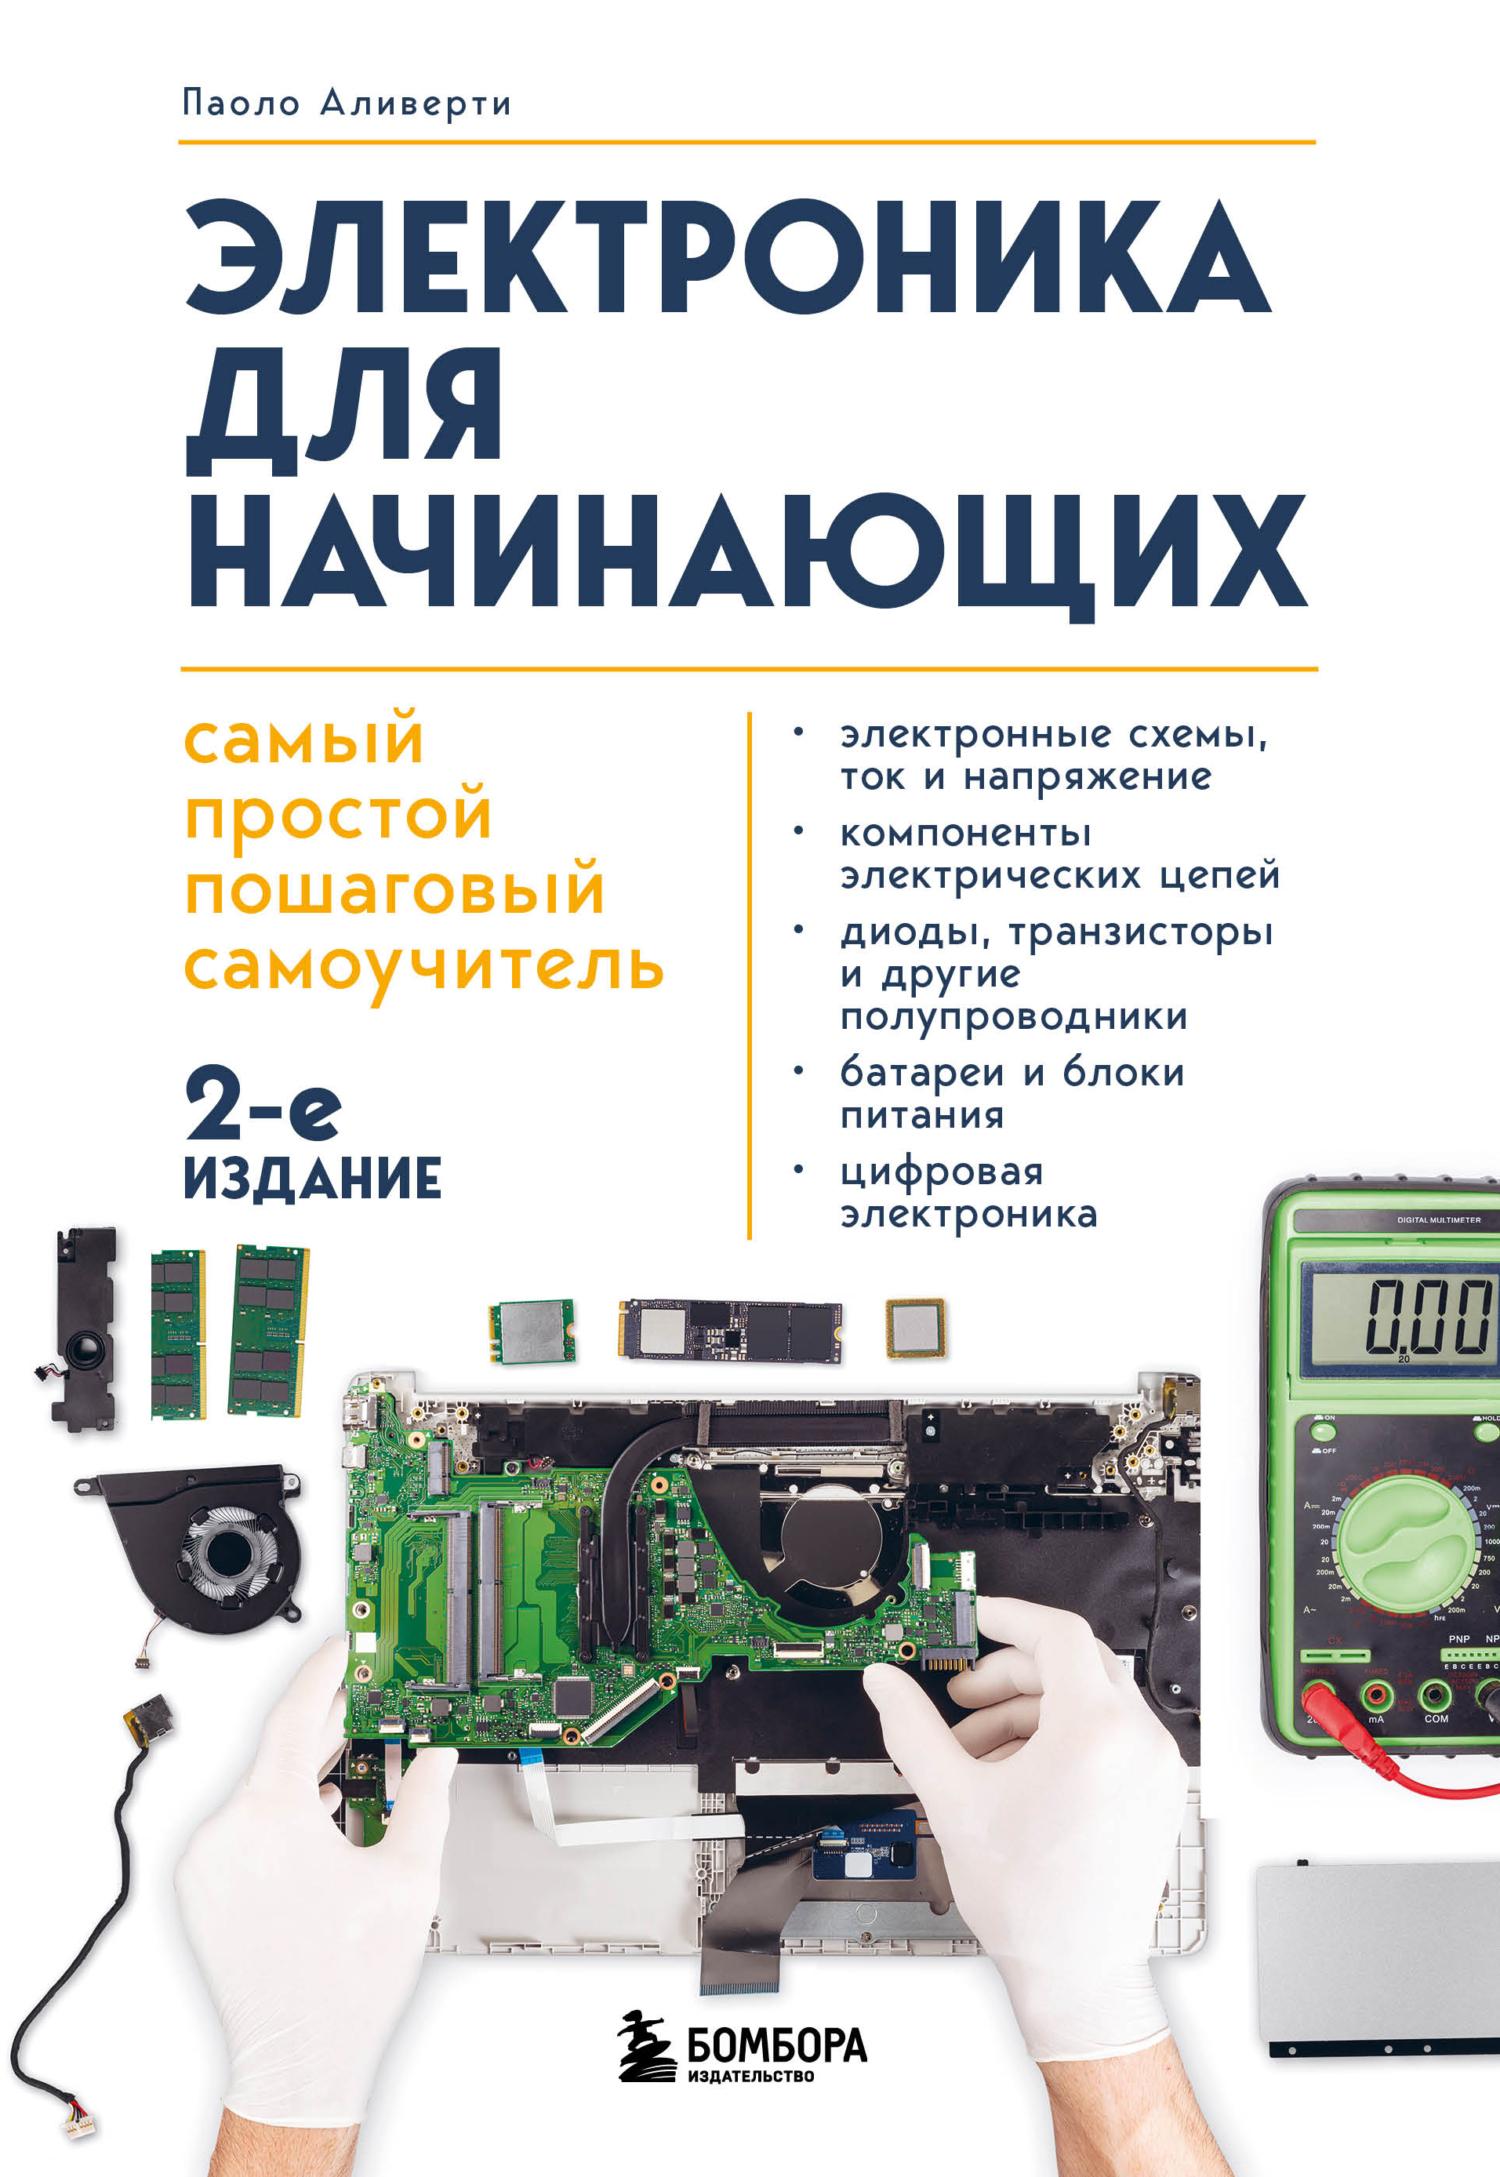 Паоло Аливерти Электроника для начинающих